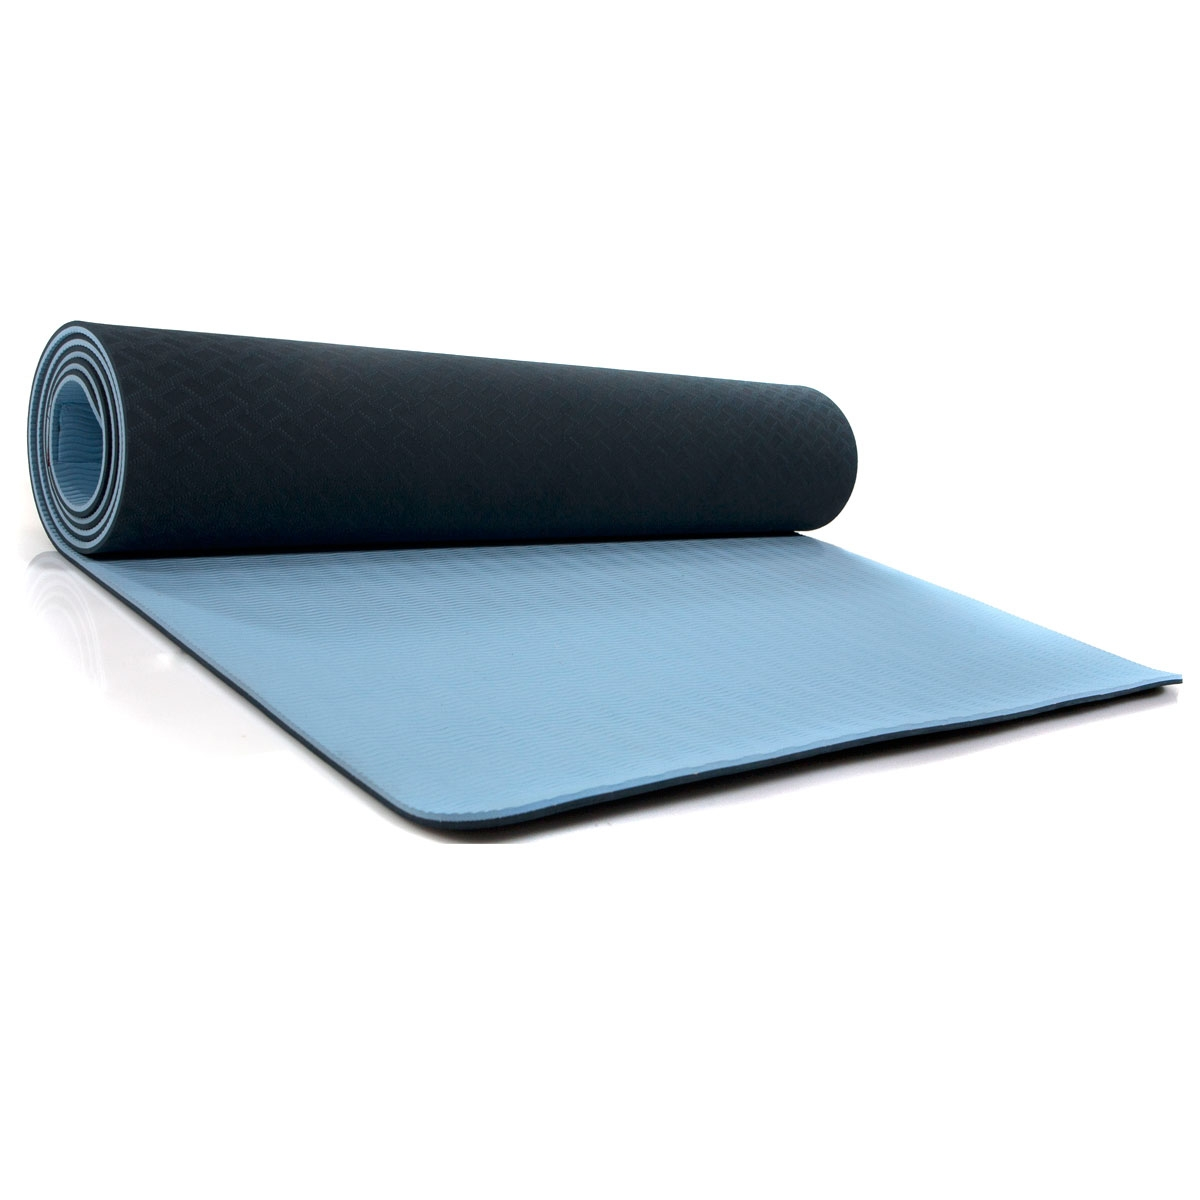 Image of FINNLO Fitnesskleingeräte Alaya Yogamatte